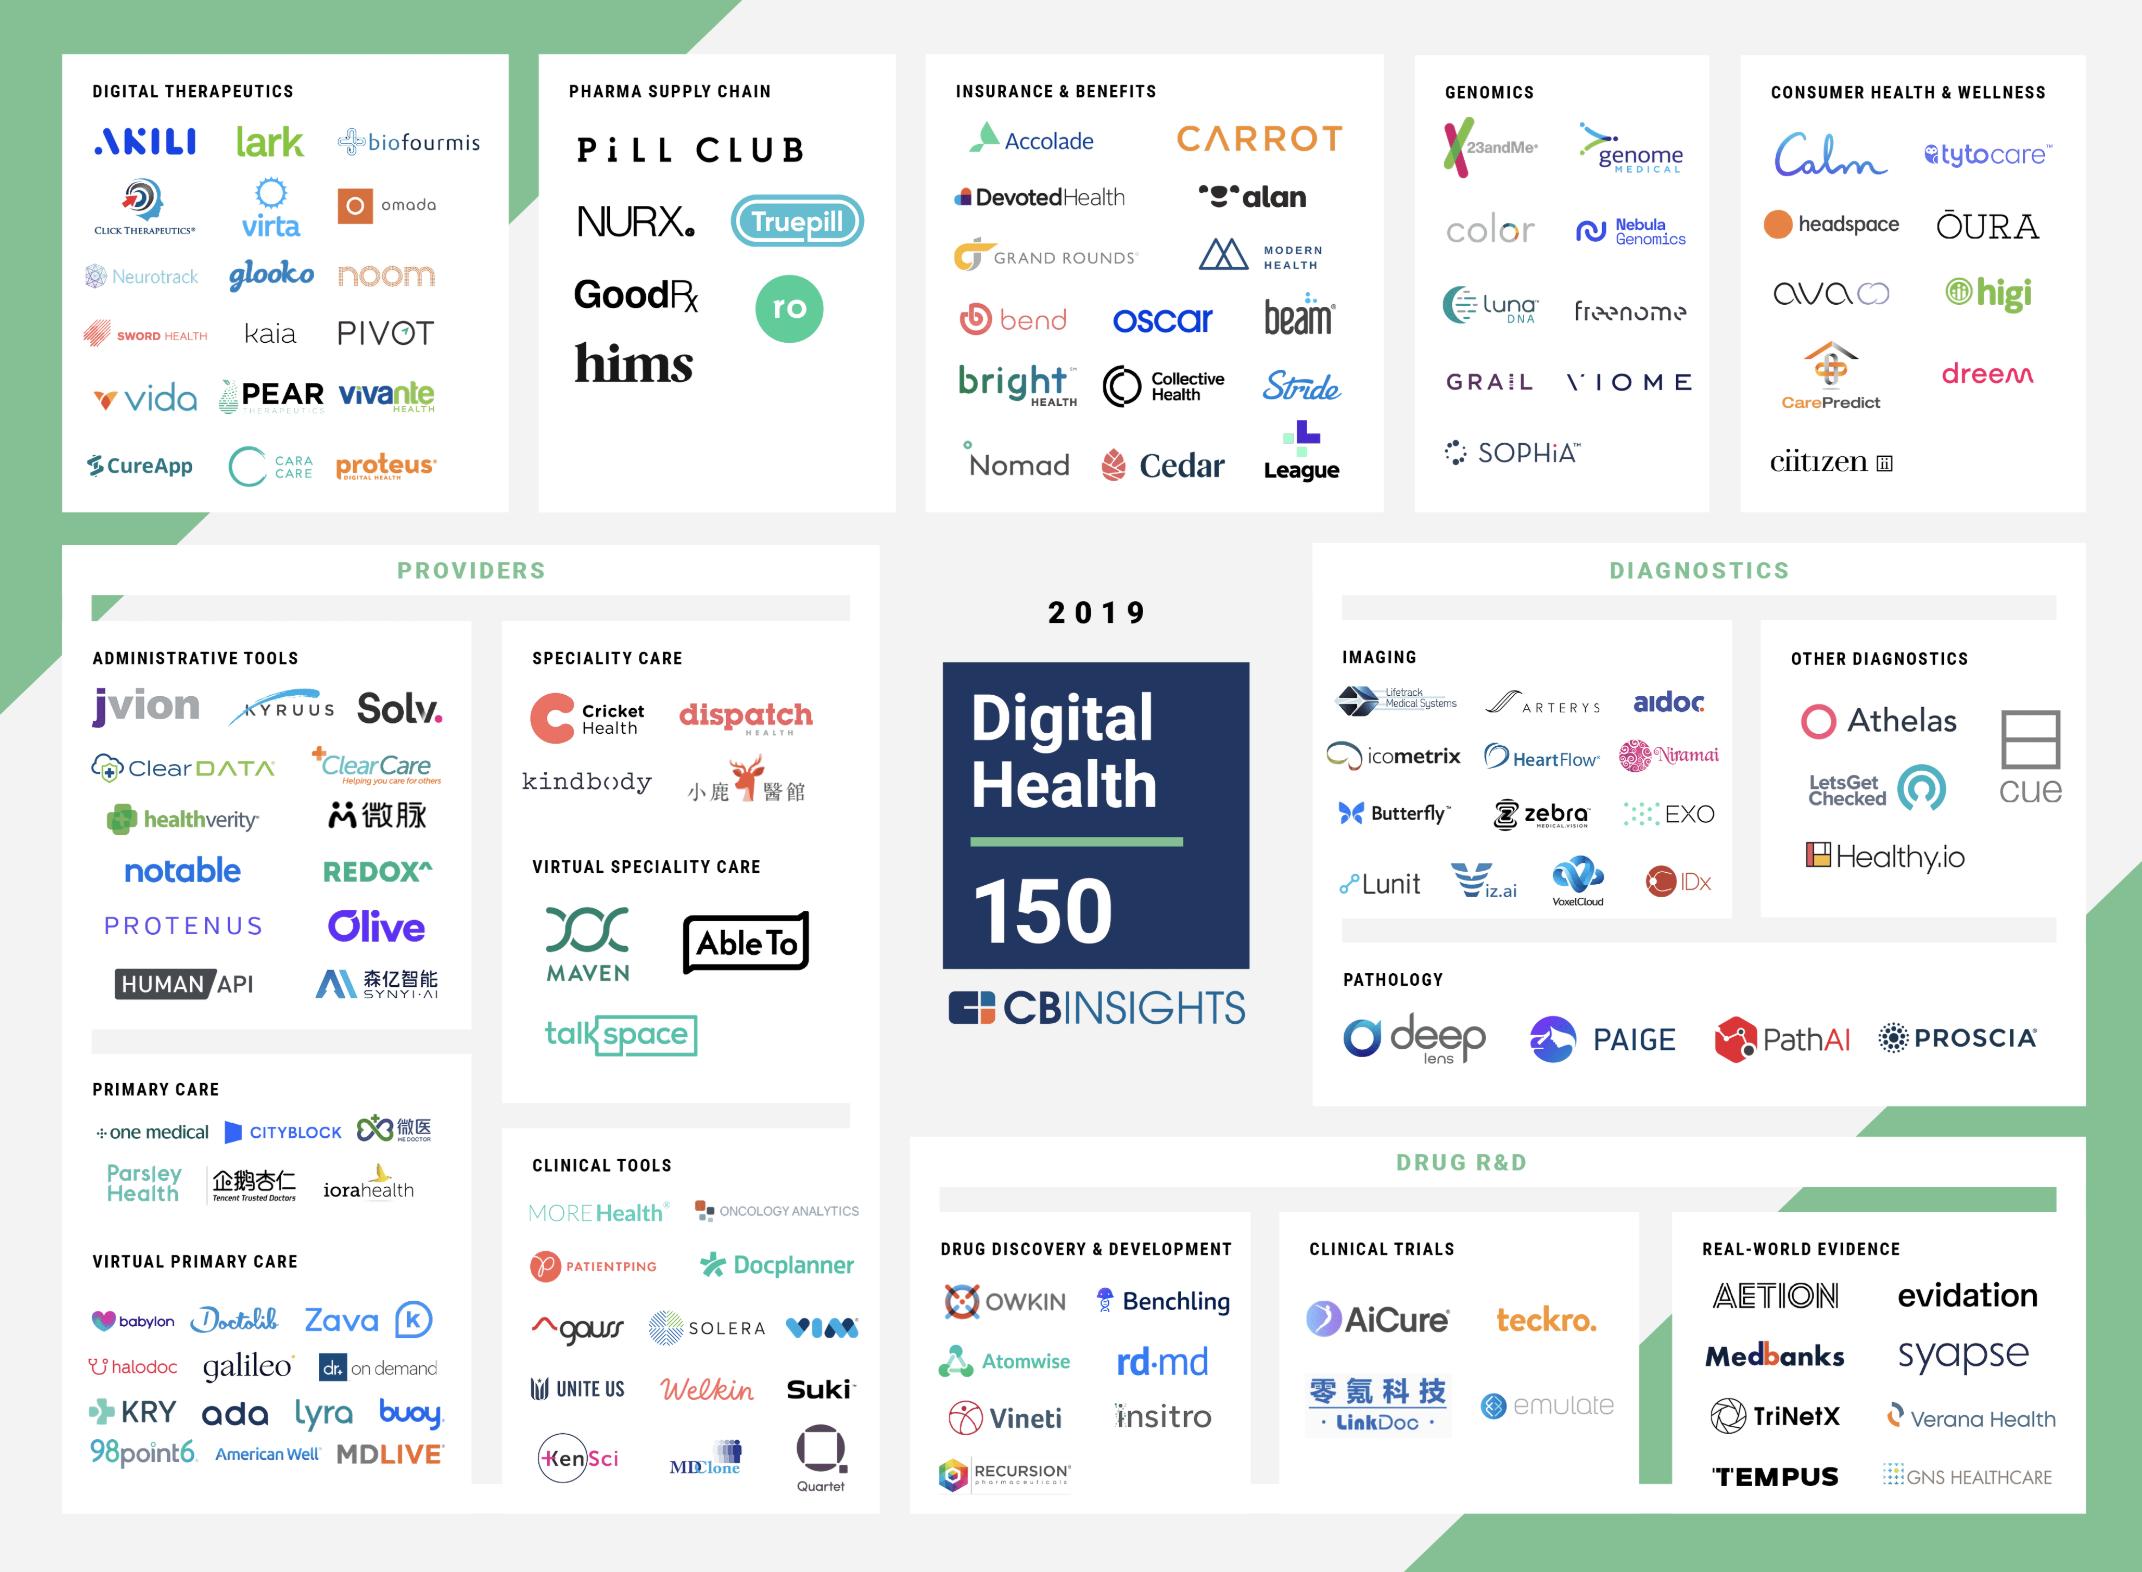 Viome Named to the 2019 CB Insights Digital Health 150, List of Most Innovative Digital Health Start